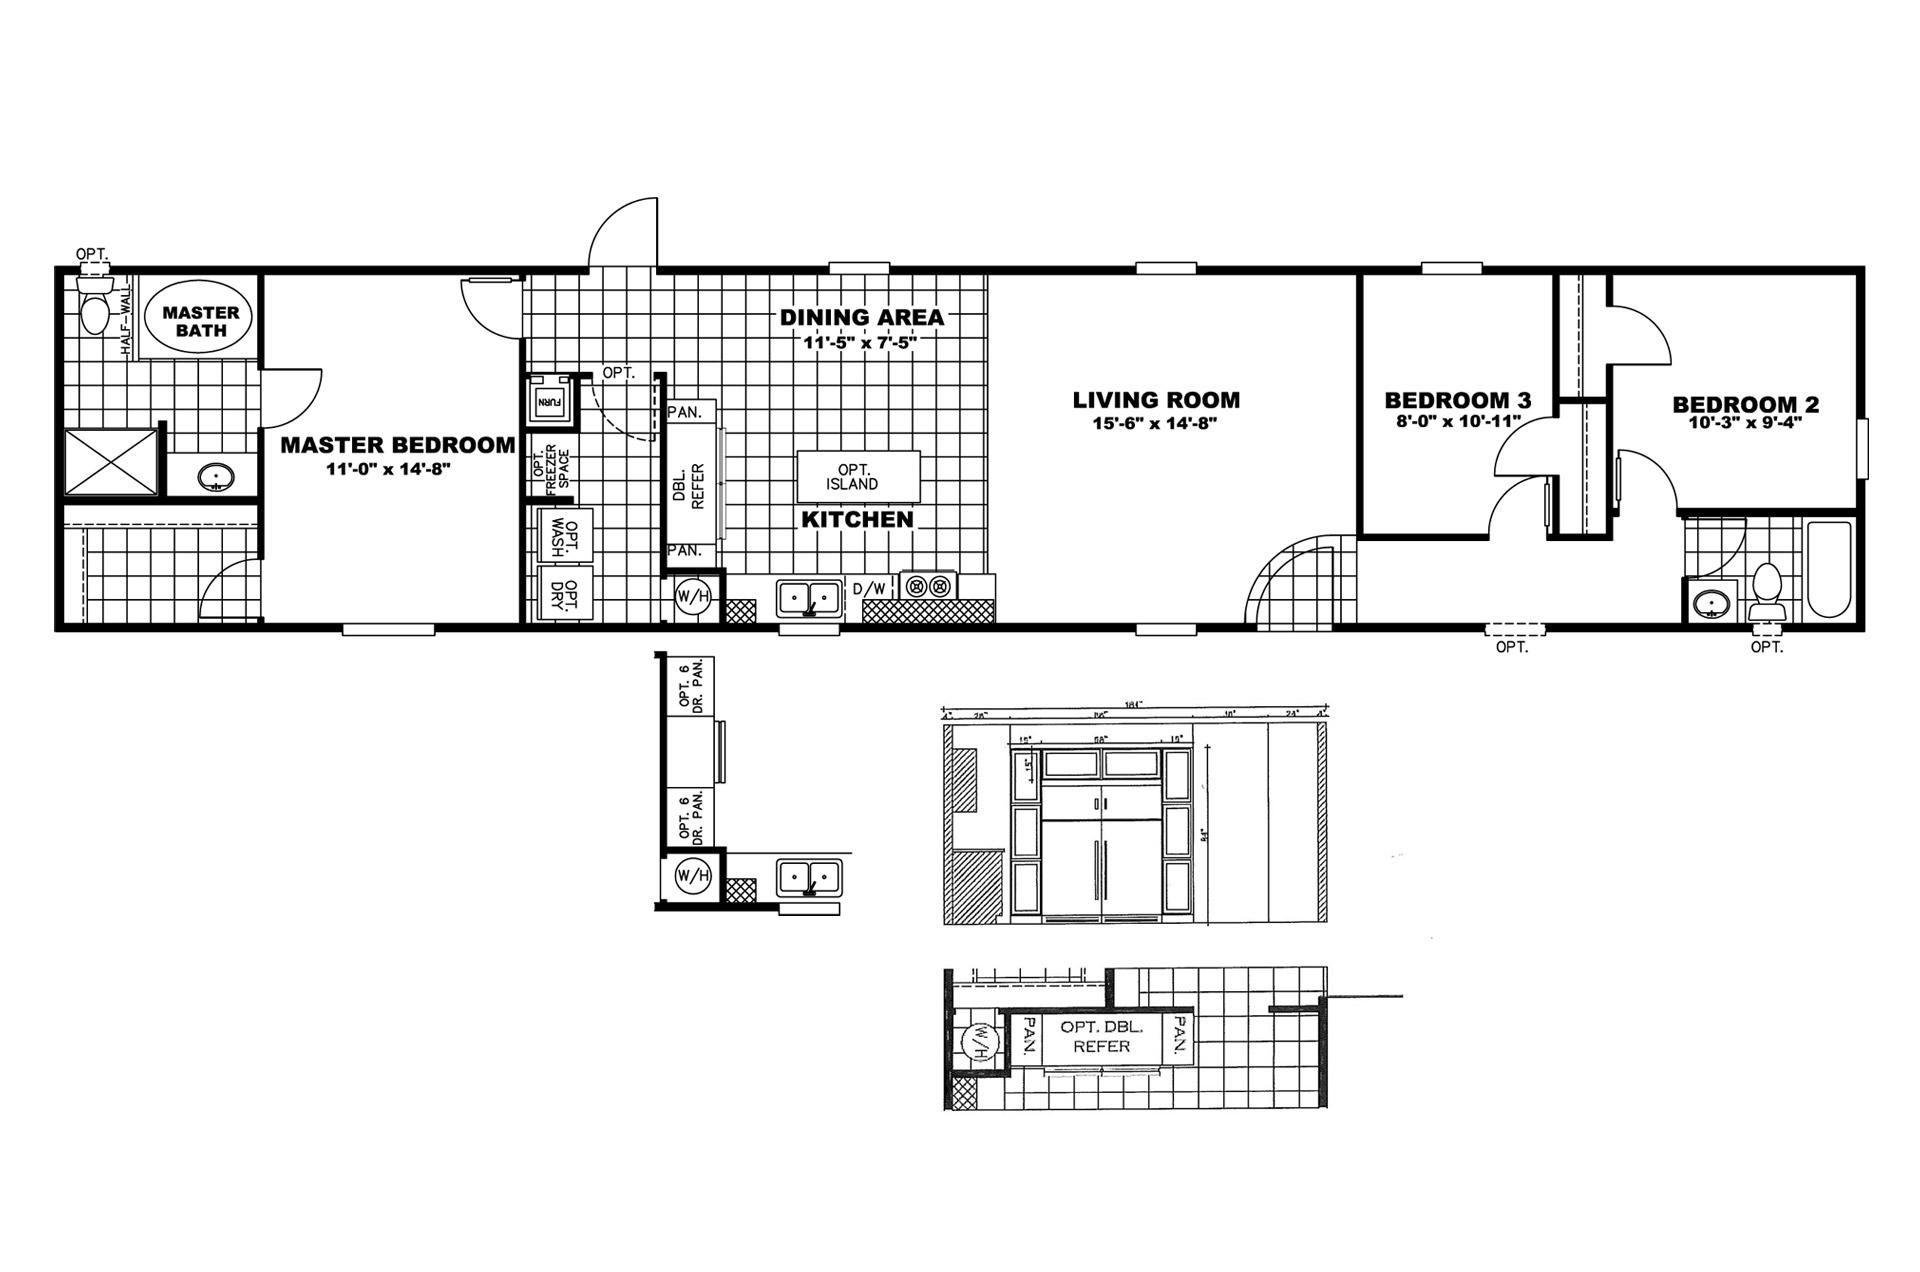 Free Mobile Home Floor Plans: Scotbilt Mobile Home Floor Plans Singelwide